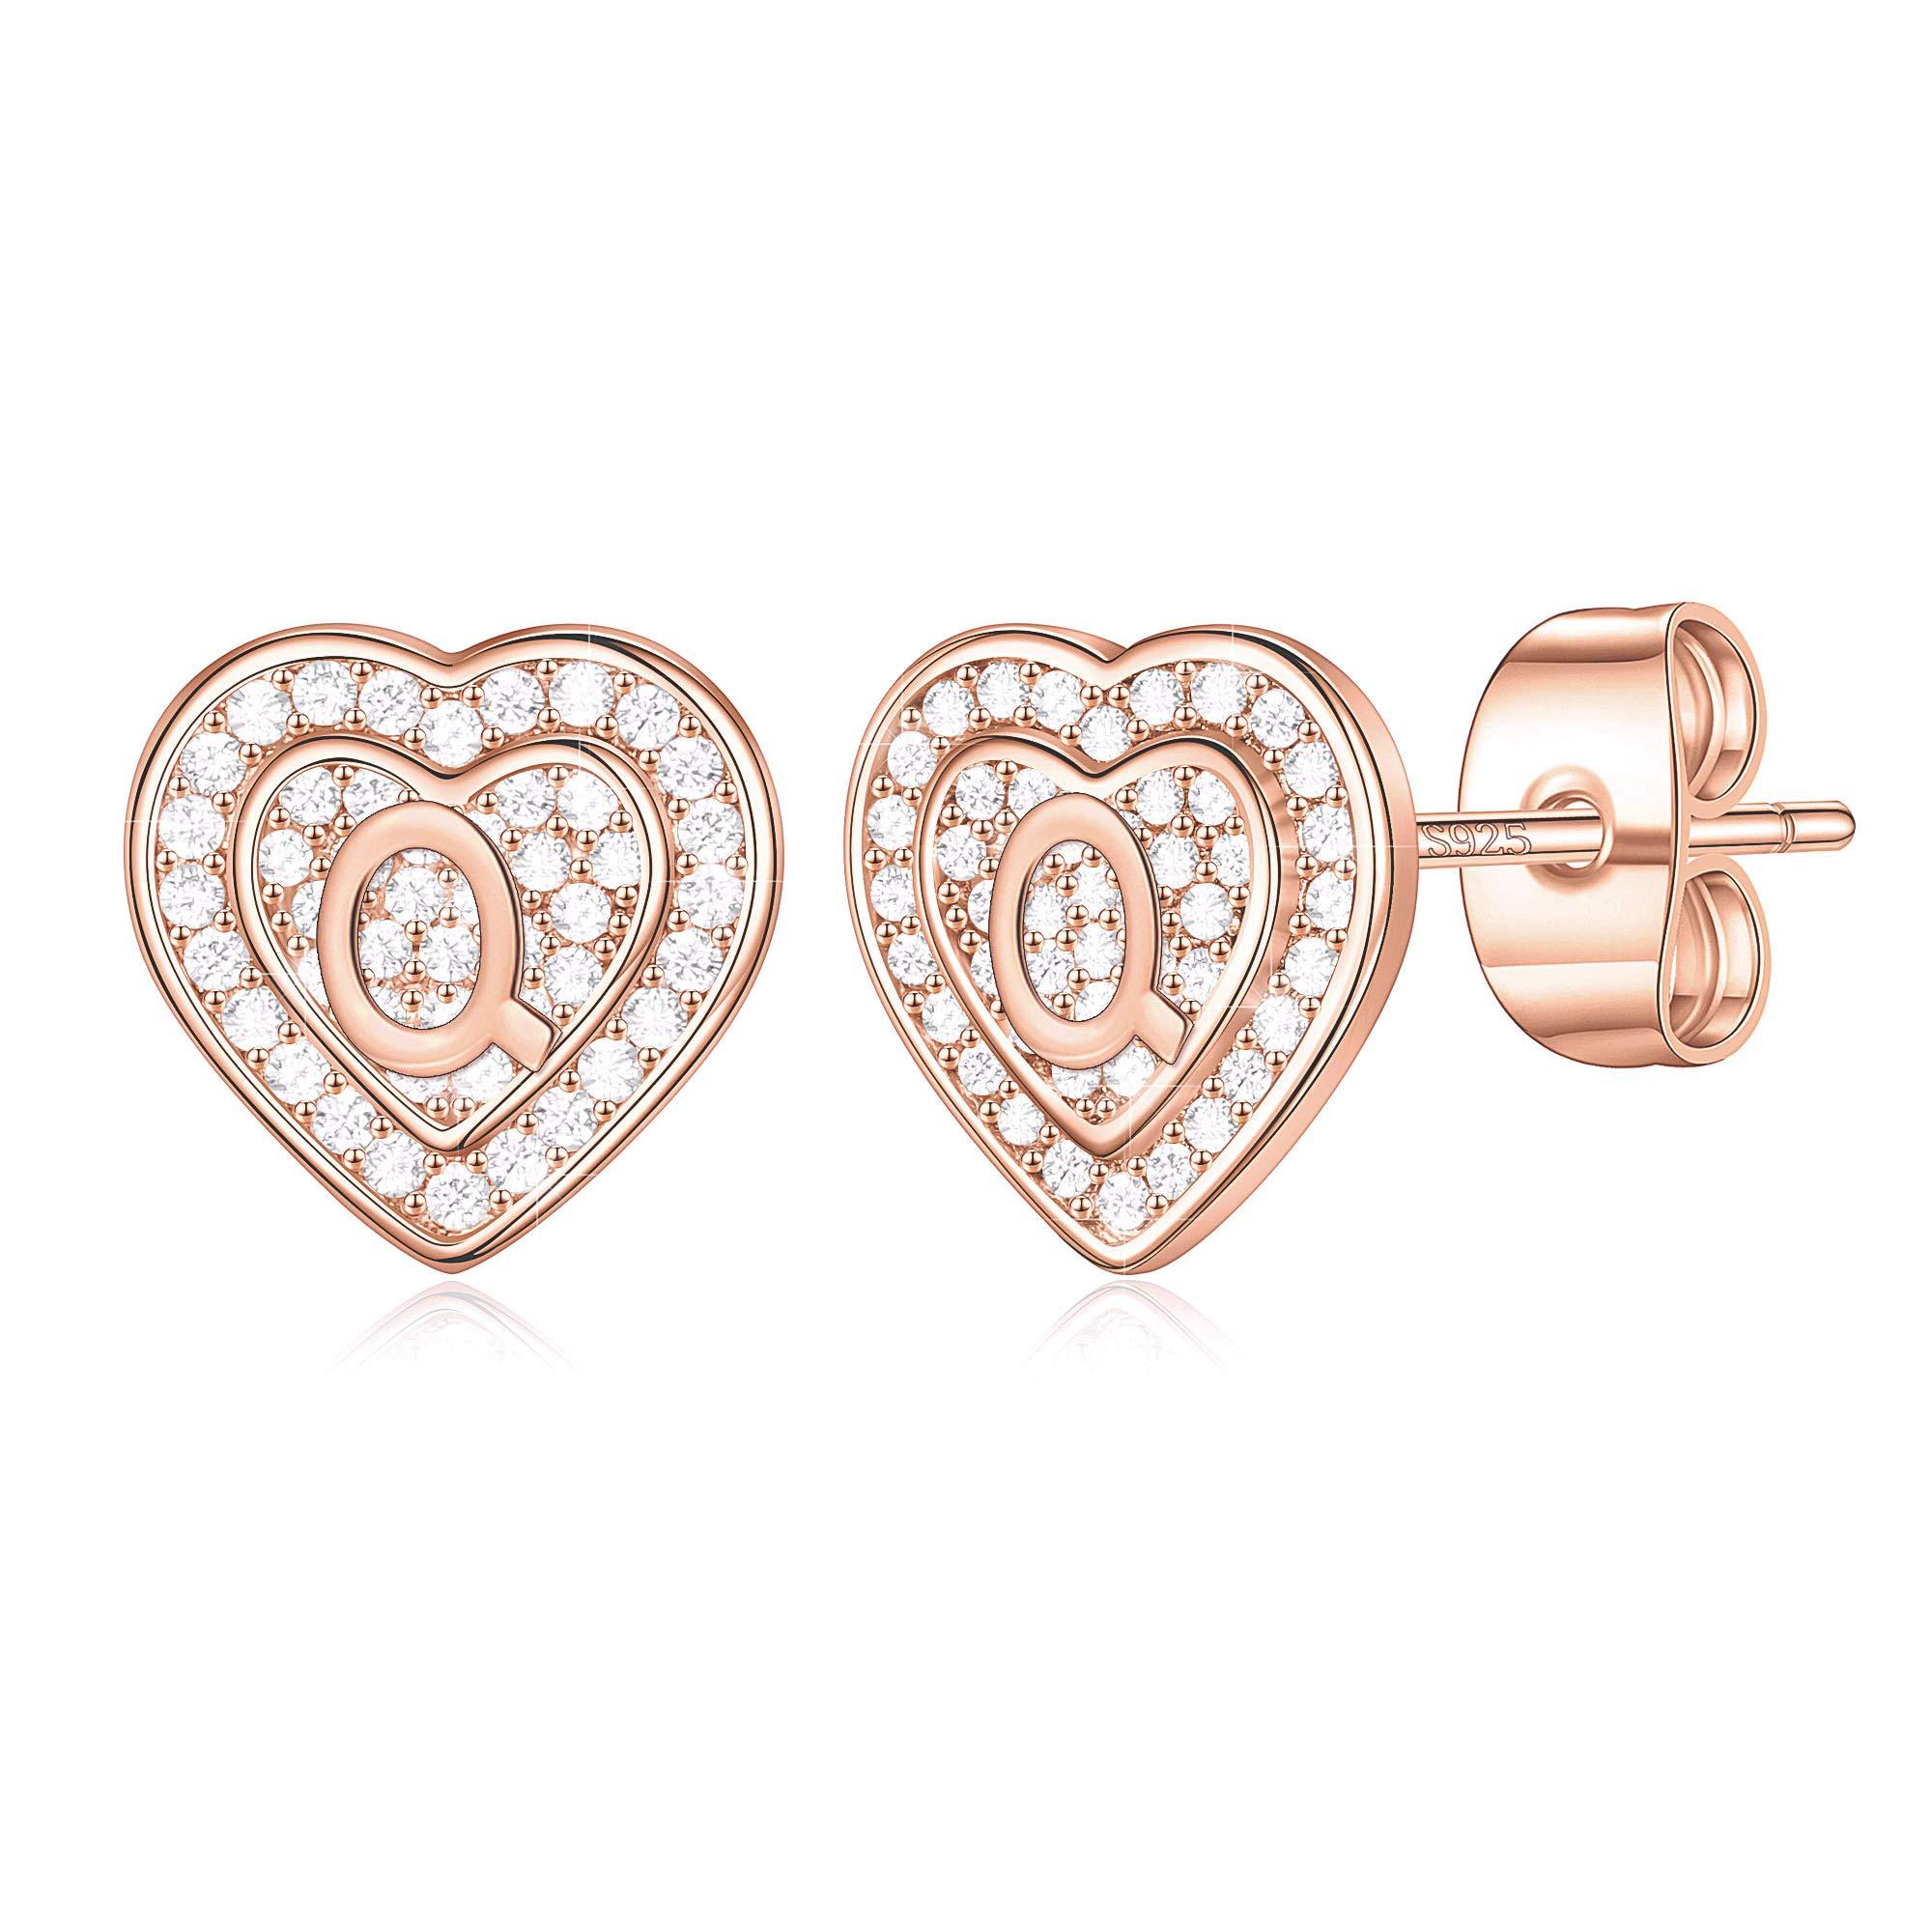 Tiny Heart Stud Earrings for Girls, S925 Sterling Silver Post Cubic Zirconia Girls Earrings Initial Earrings for Women Girls Earrings for Kids